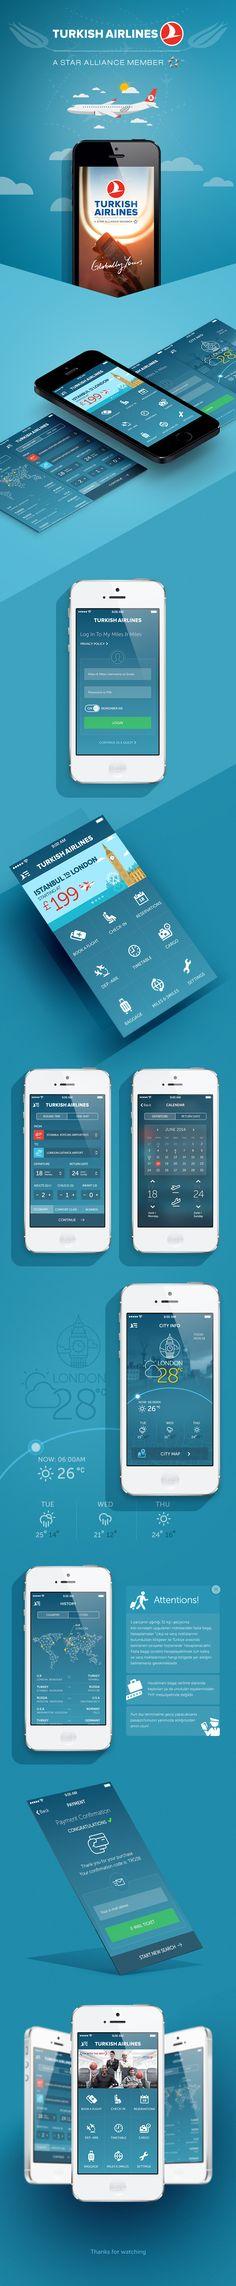 Turkish Airlines App Redesign by Murat Gürsoy, via Behance. Web Design, App Ui Design, User Interface Design, Flat Design, Graphic Design, Mobile Application Design, Mobile Ui Design, Email Application, Design Thinking